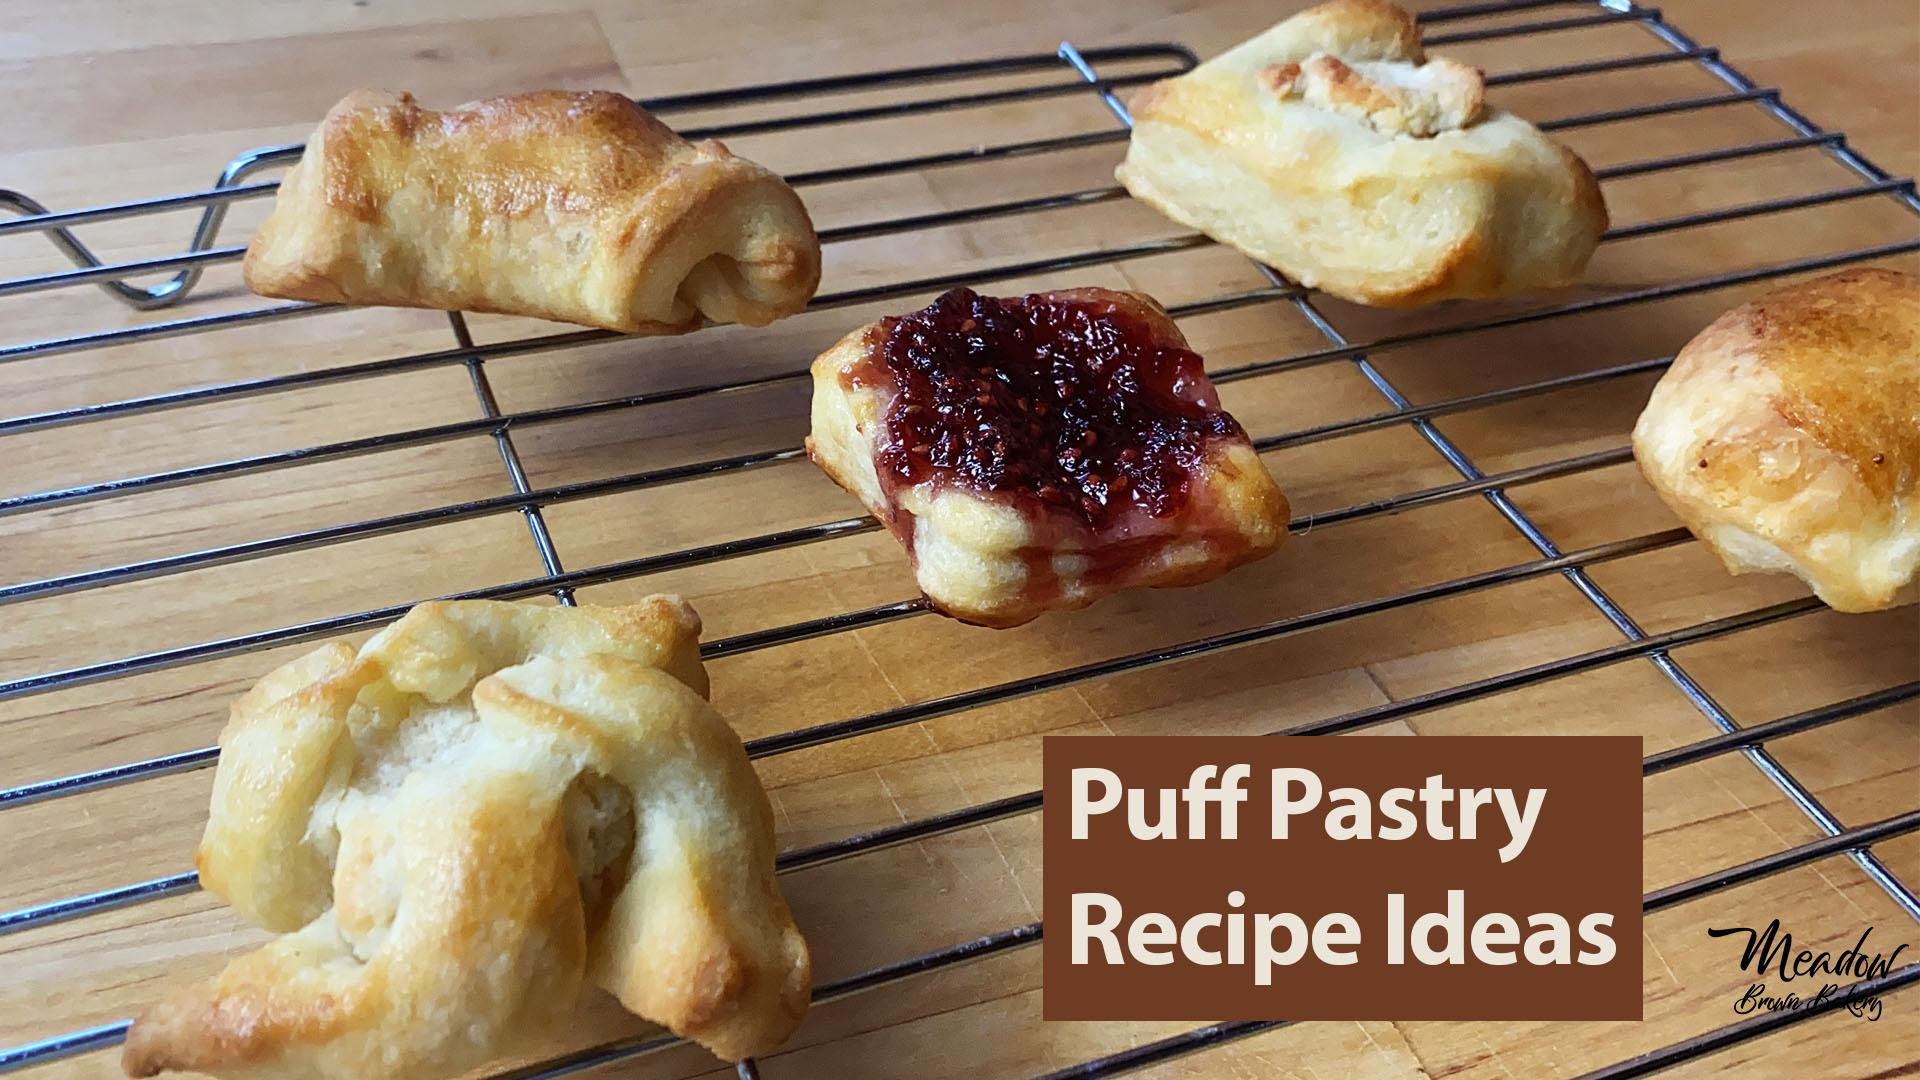 Sweet puff pastry recipe ideas uk